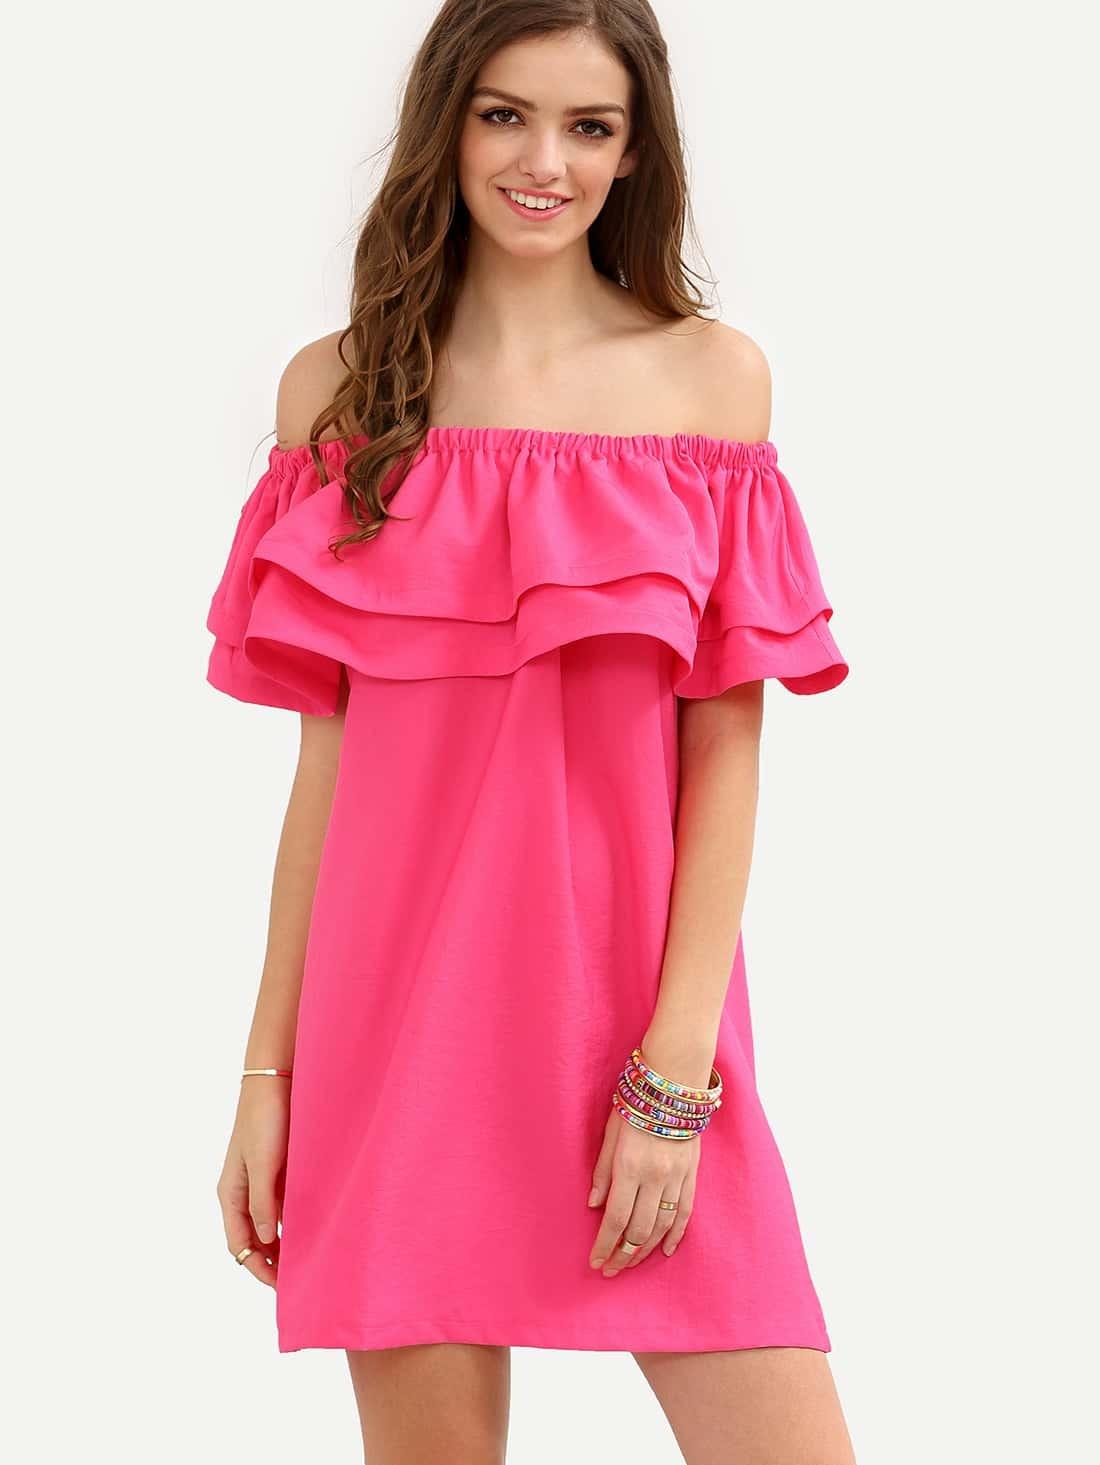 9b3b81a94586 Hot Pink Off The Shoulder Ruffle Shift Dress EmmaCloth-Women Fast ...